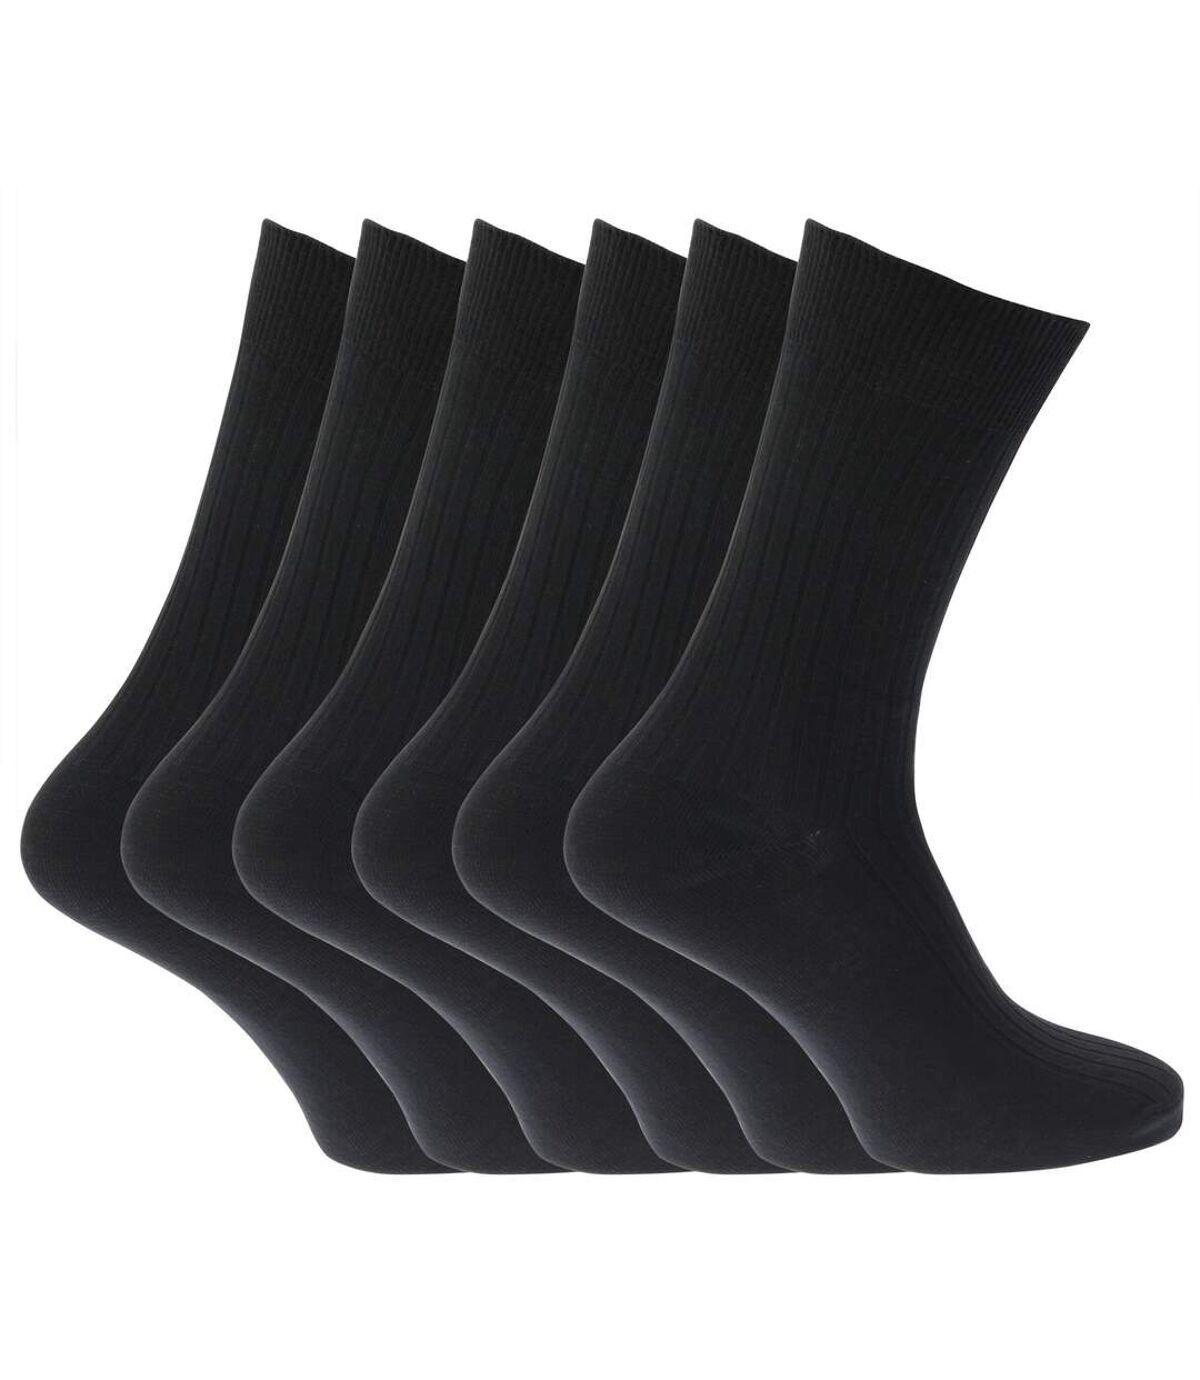 Mens 100% Cotton Ribbed Classic Socks (Pack Of 6) (Black) - UTMB144